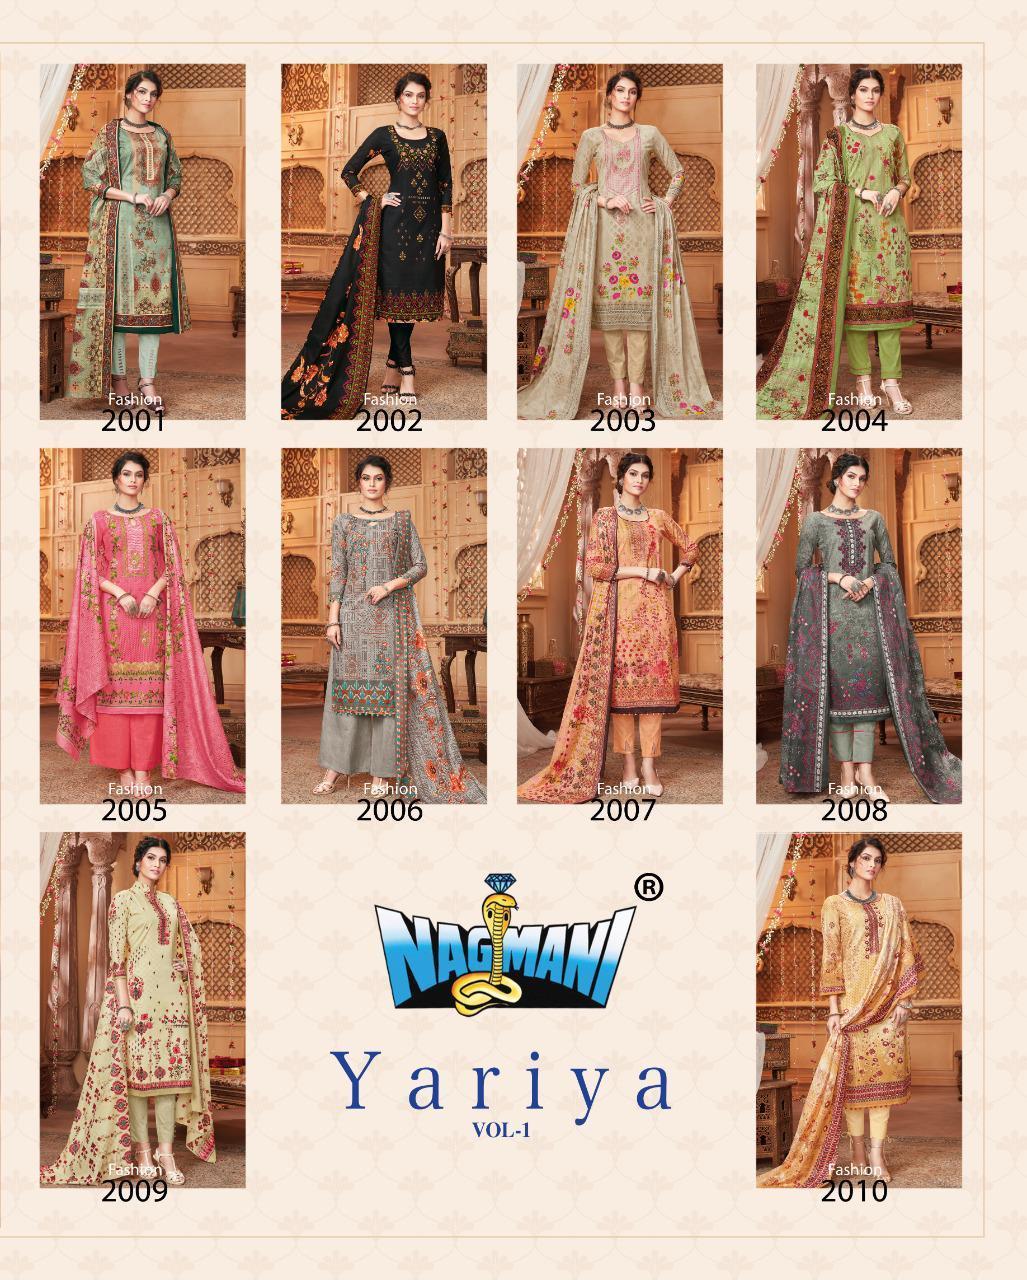 Nagmani-Yariya-Vol-1-17